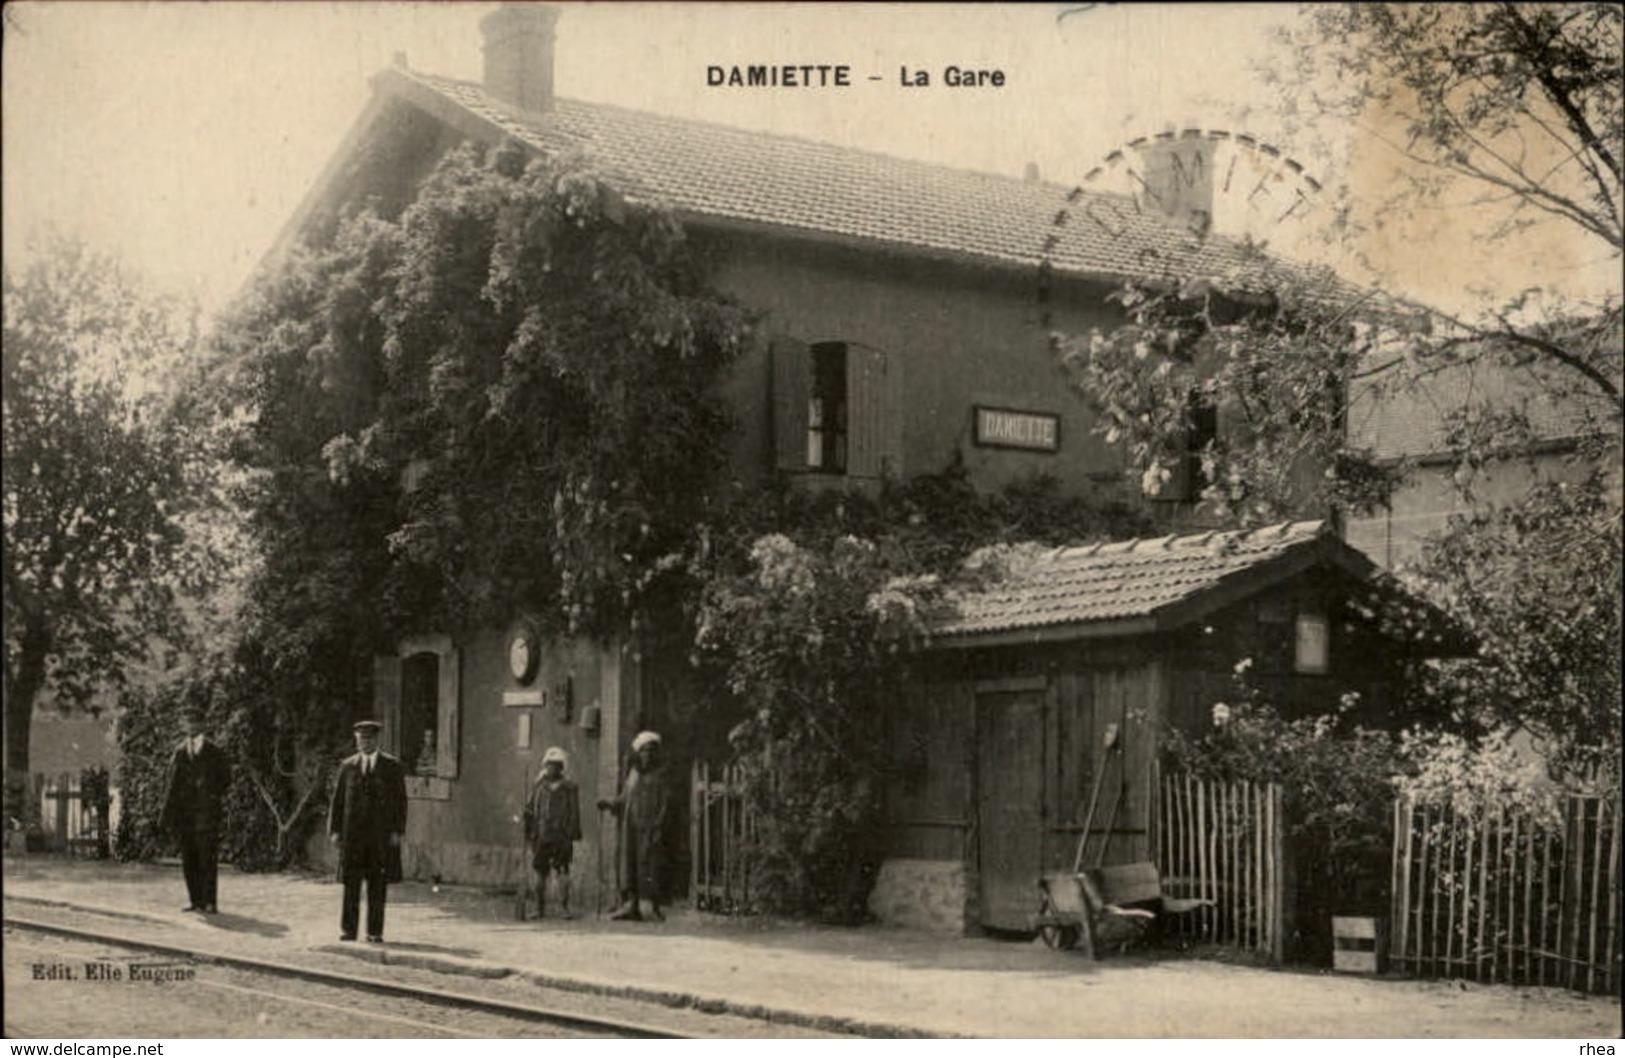 EGYPTE - DAMIETTE - Gare - Cheminots - Damiette